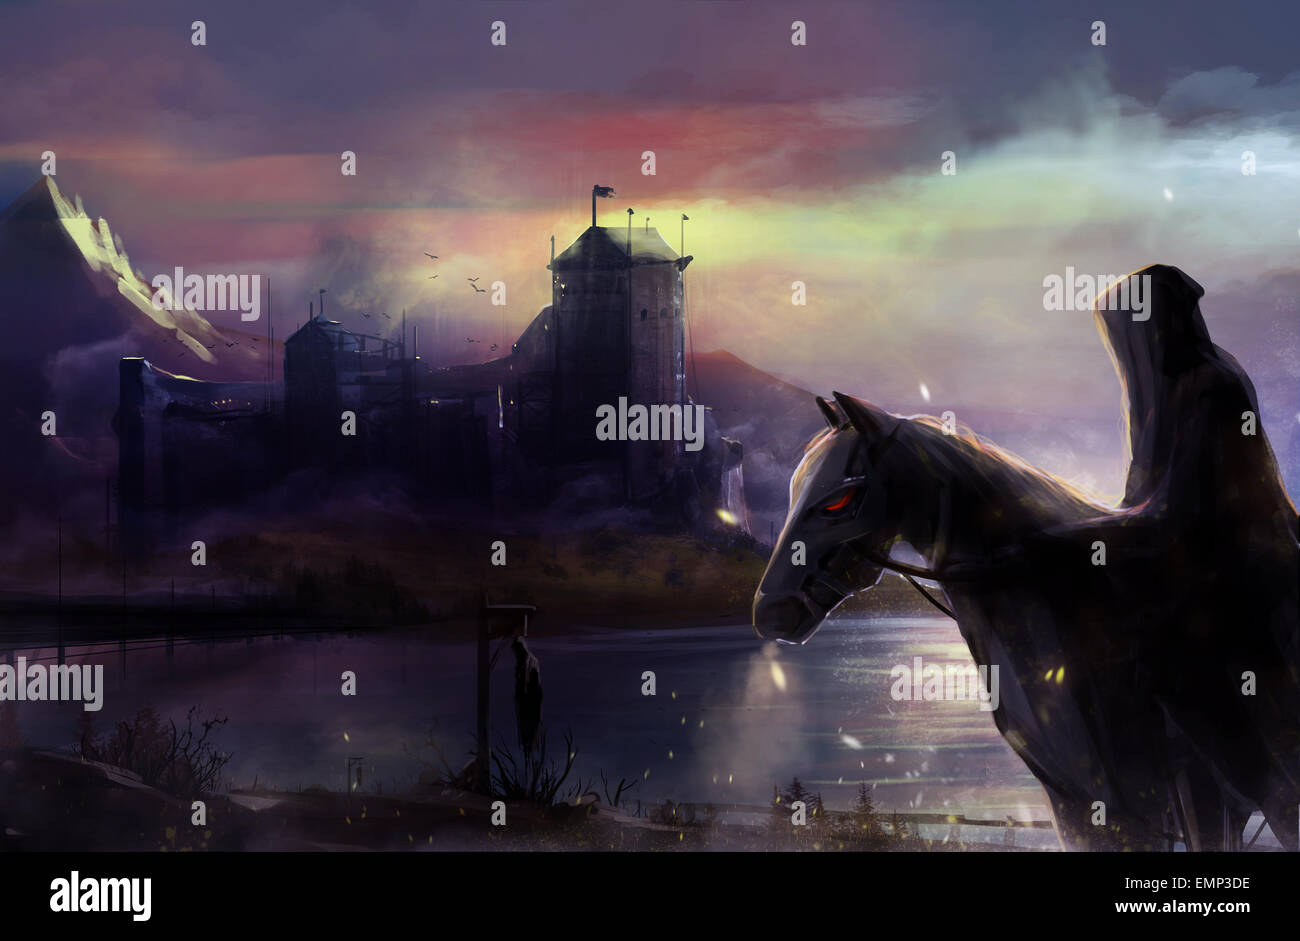 Black Horseman Castle Fantasy Black Horse Rider With Background Stock Photo Alamy